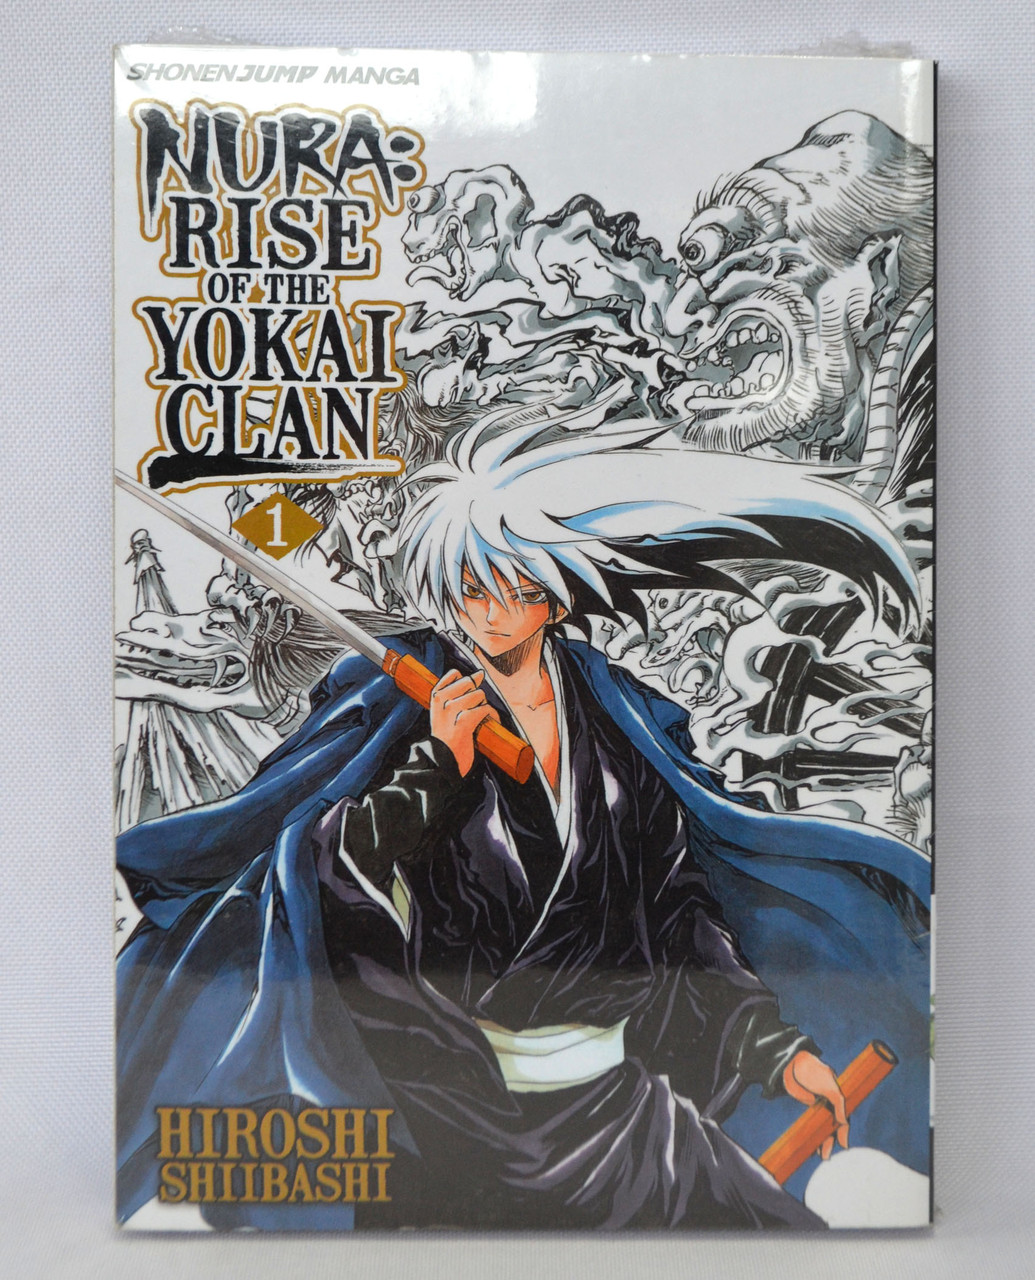 Manga Nura: Rise of the Yokai Clan, Vol. 1 (English language)